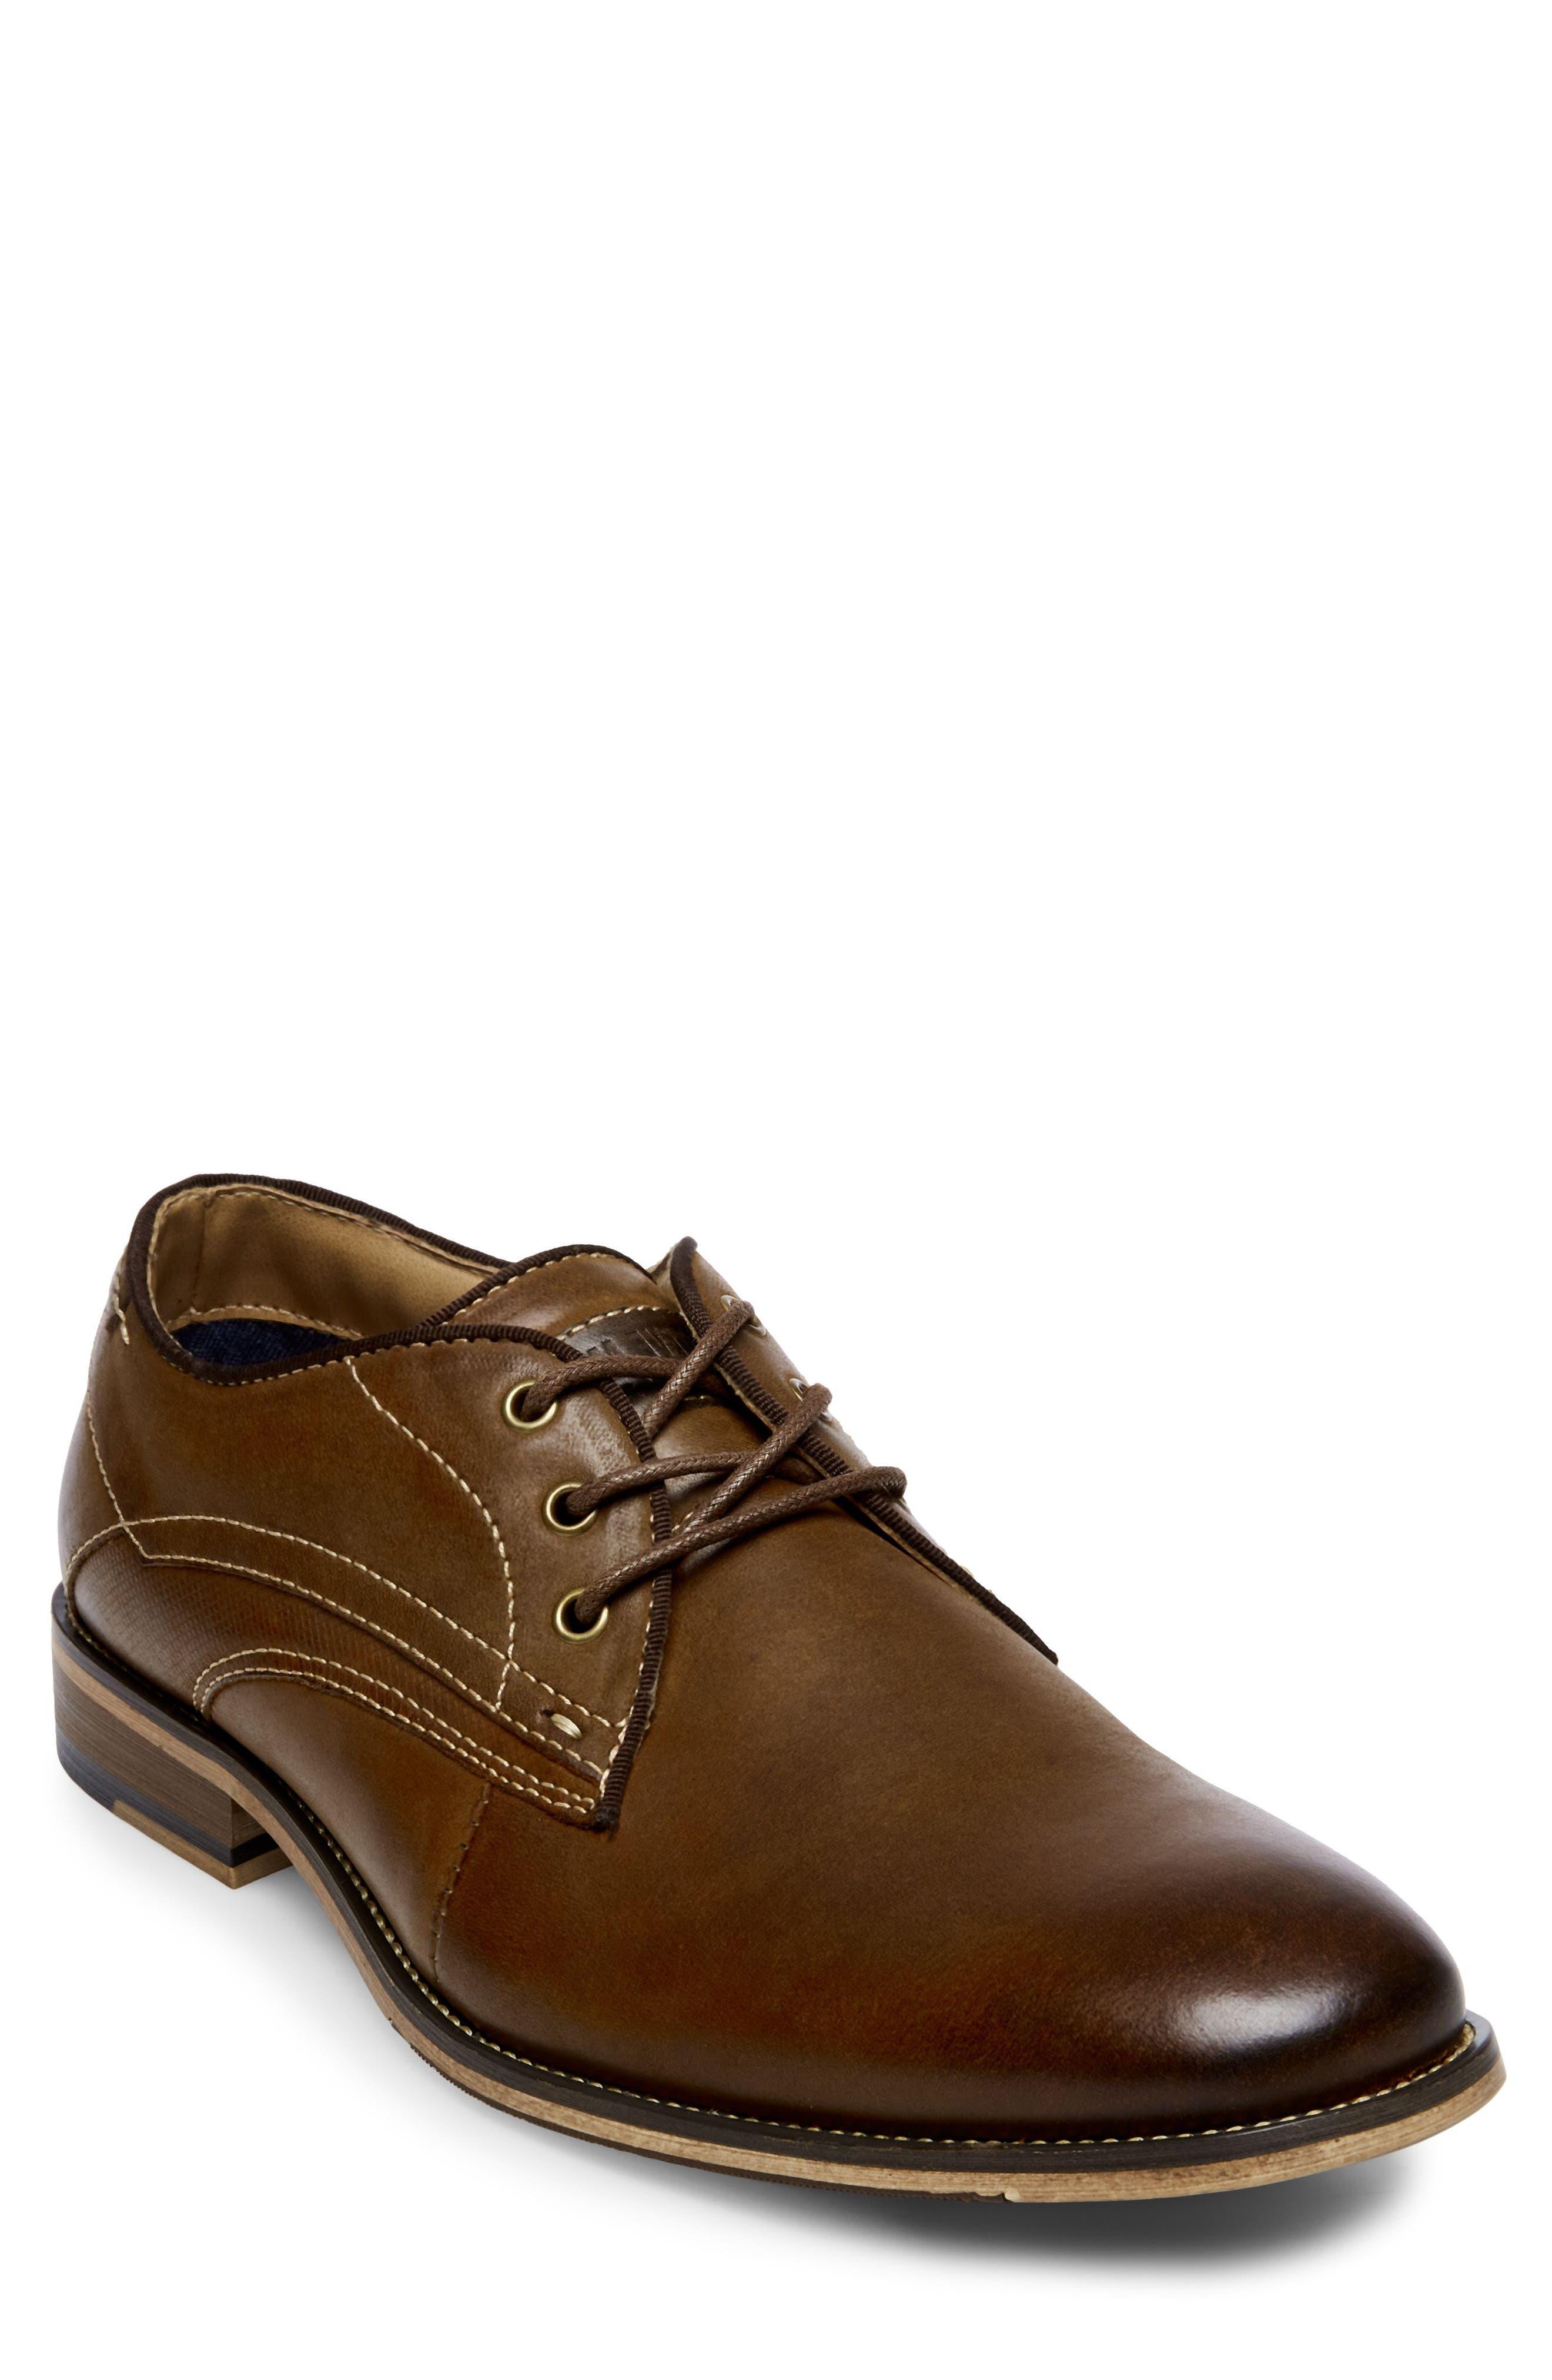 Jetset Plain Toe Derby,                             Main thumbnail 1, color,                             Dark Tan Leather